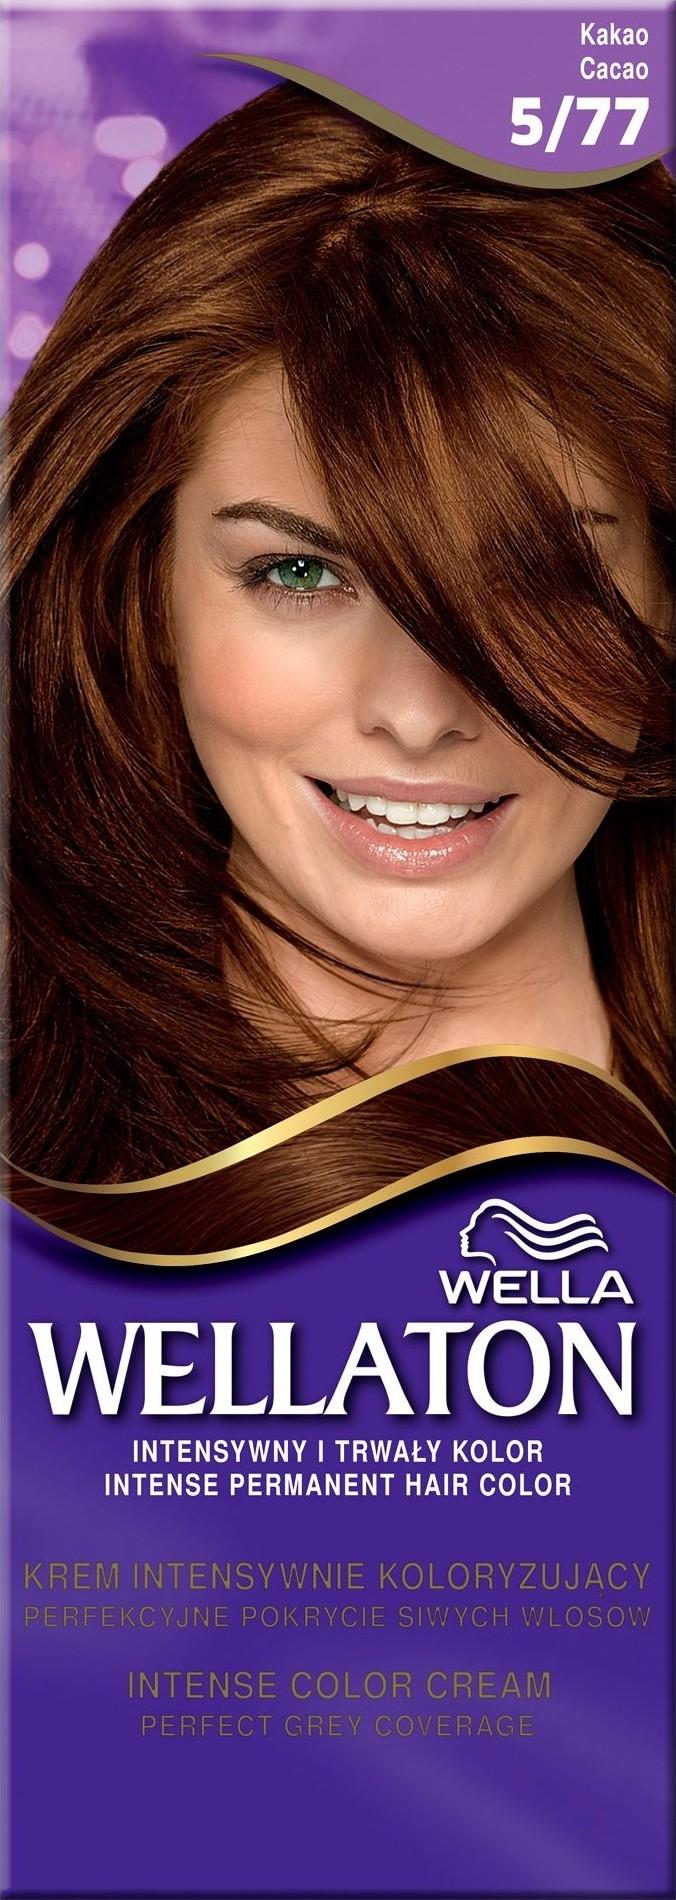 Fotografie Wella Wellaton Intense Color Cream krémová barva na vlasy 5/77 kakaová